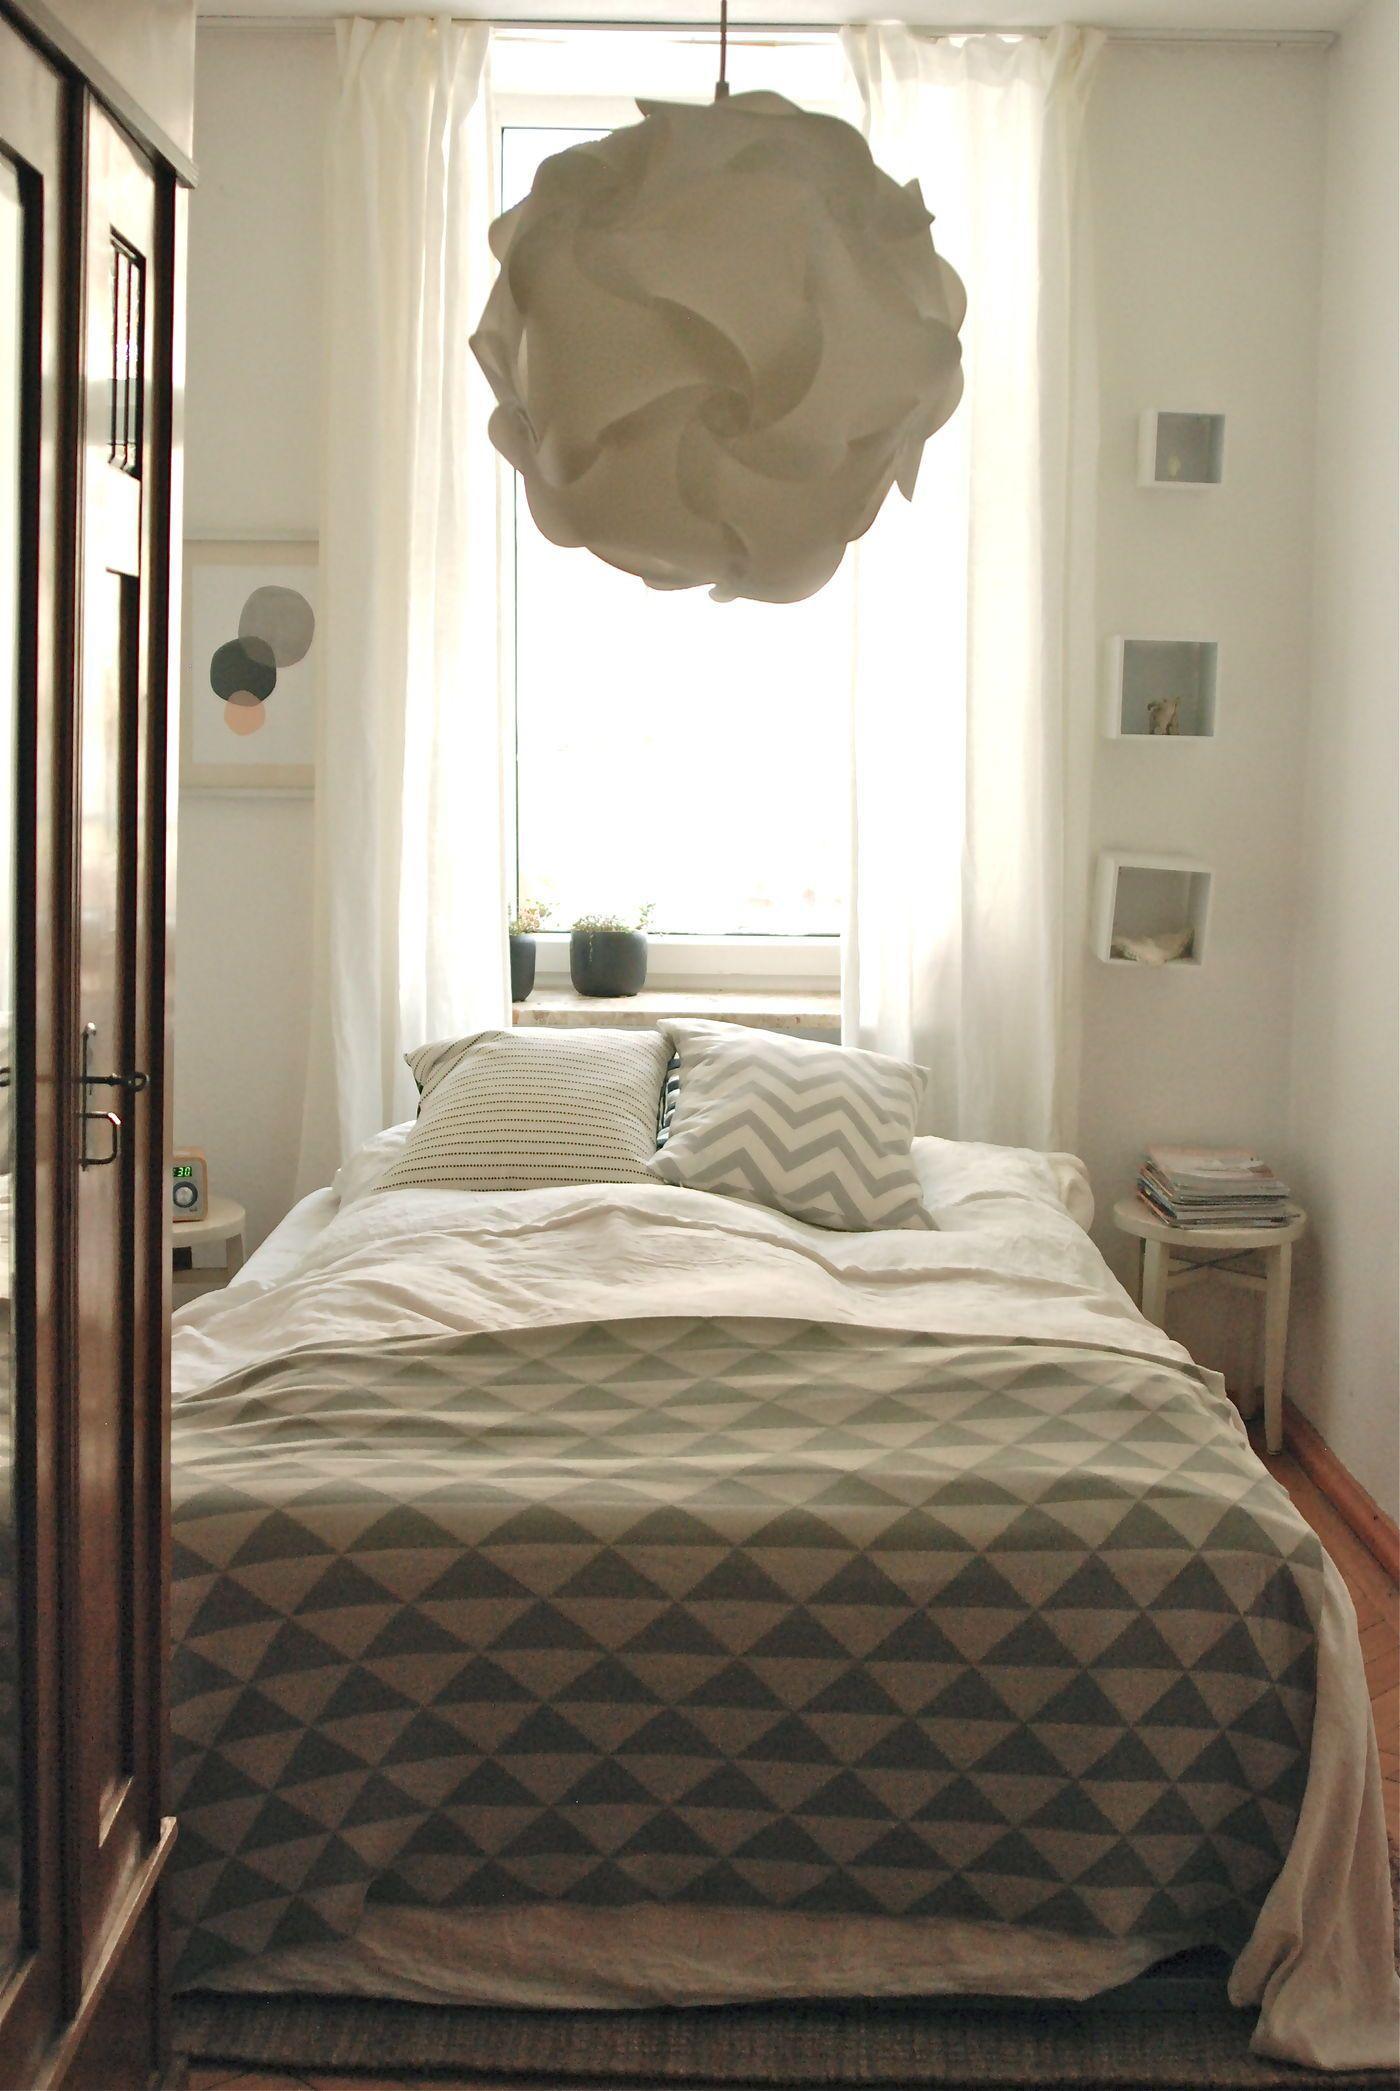 Kleines Zimmer Bett Ideen